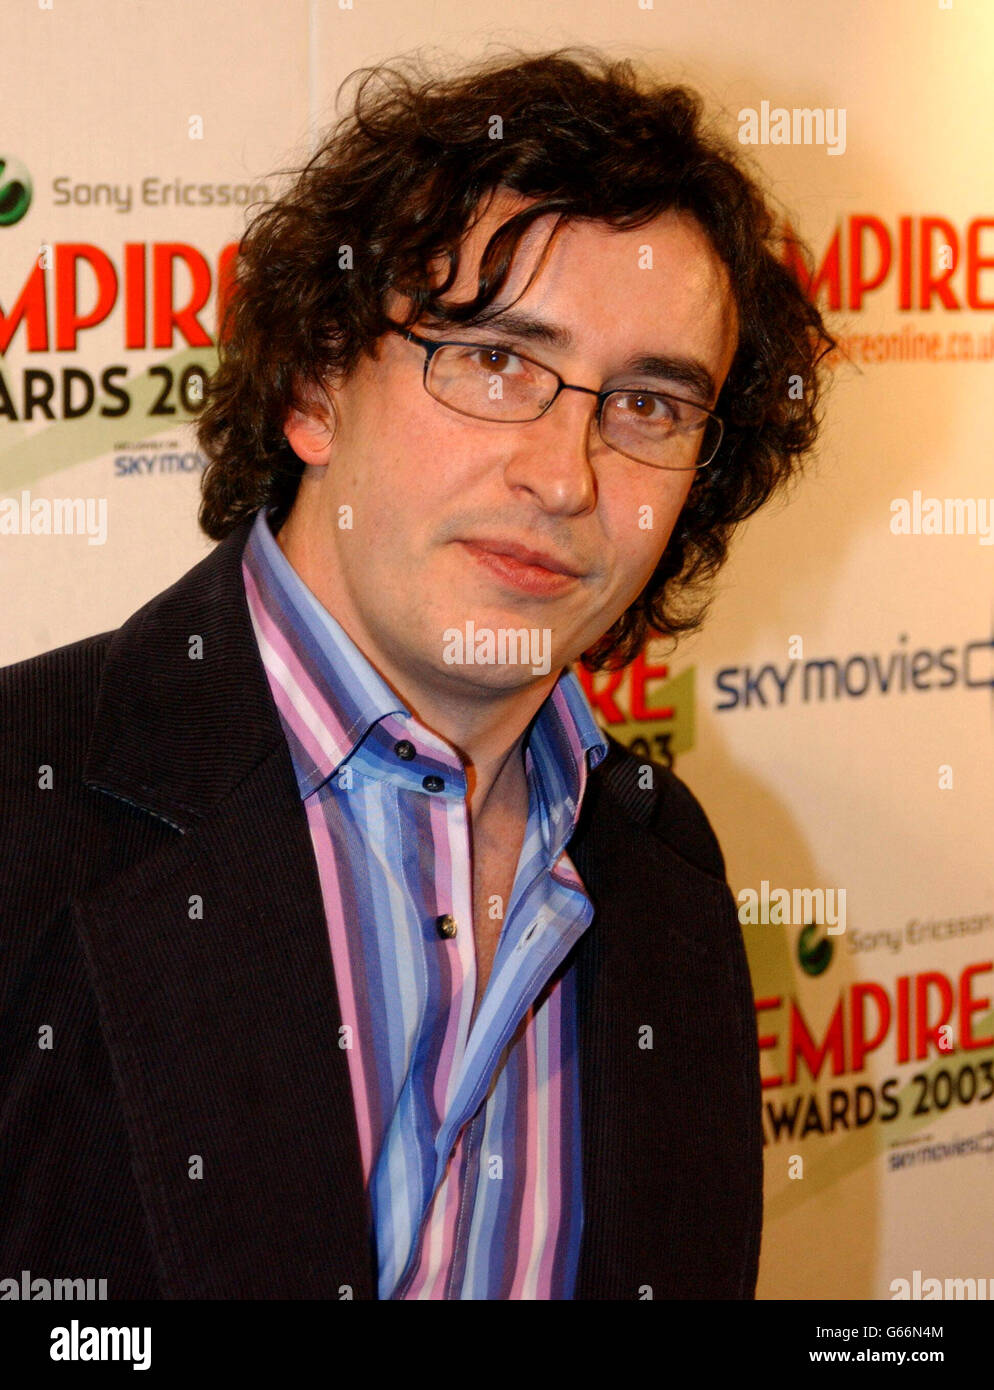 Coogan - Empire Awards Stock Photo